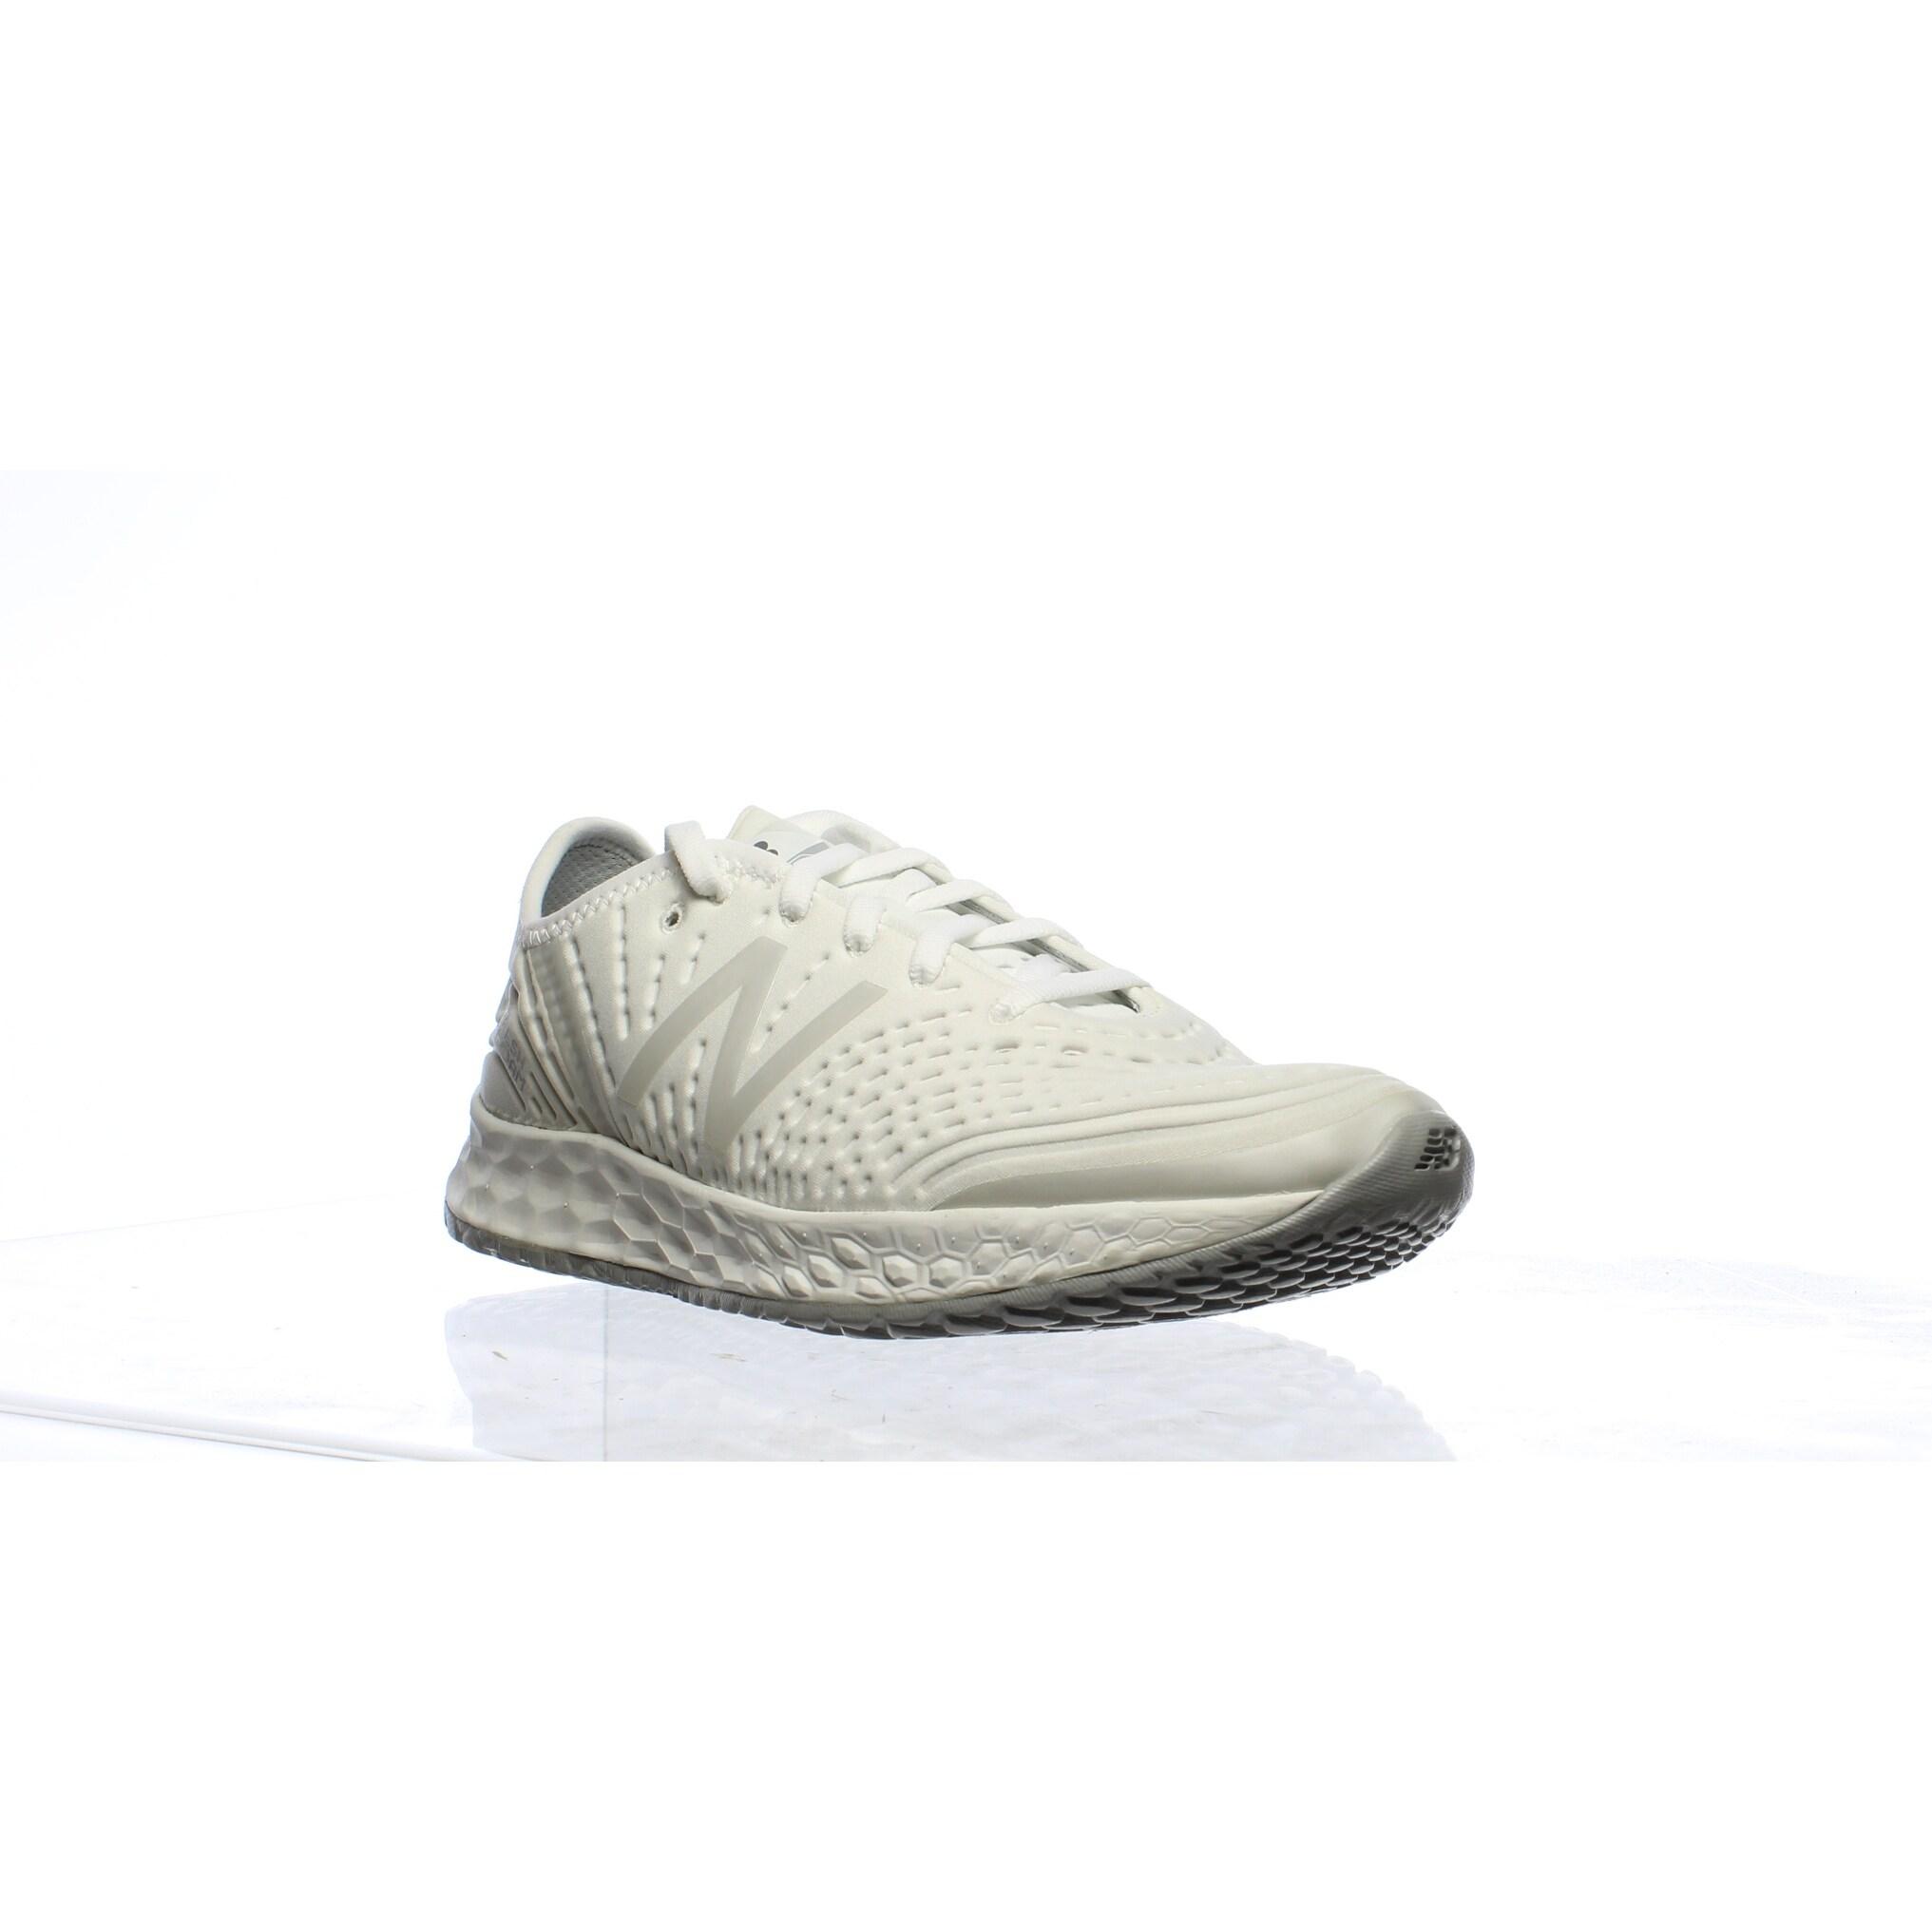 womens new balance shoes size 6